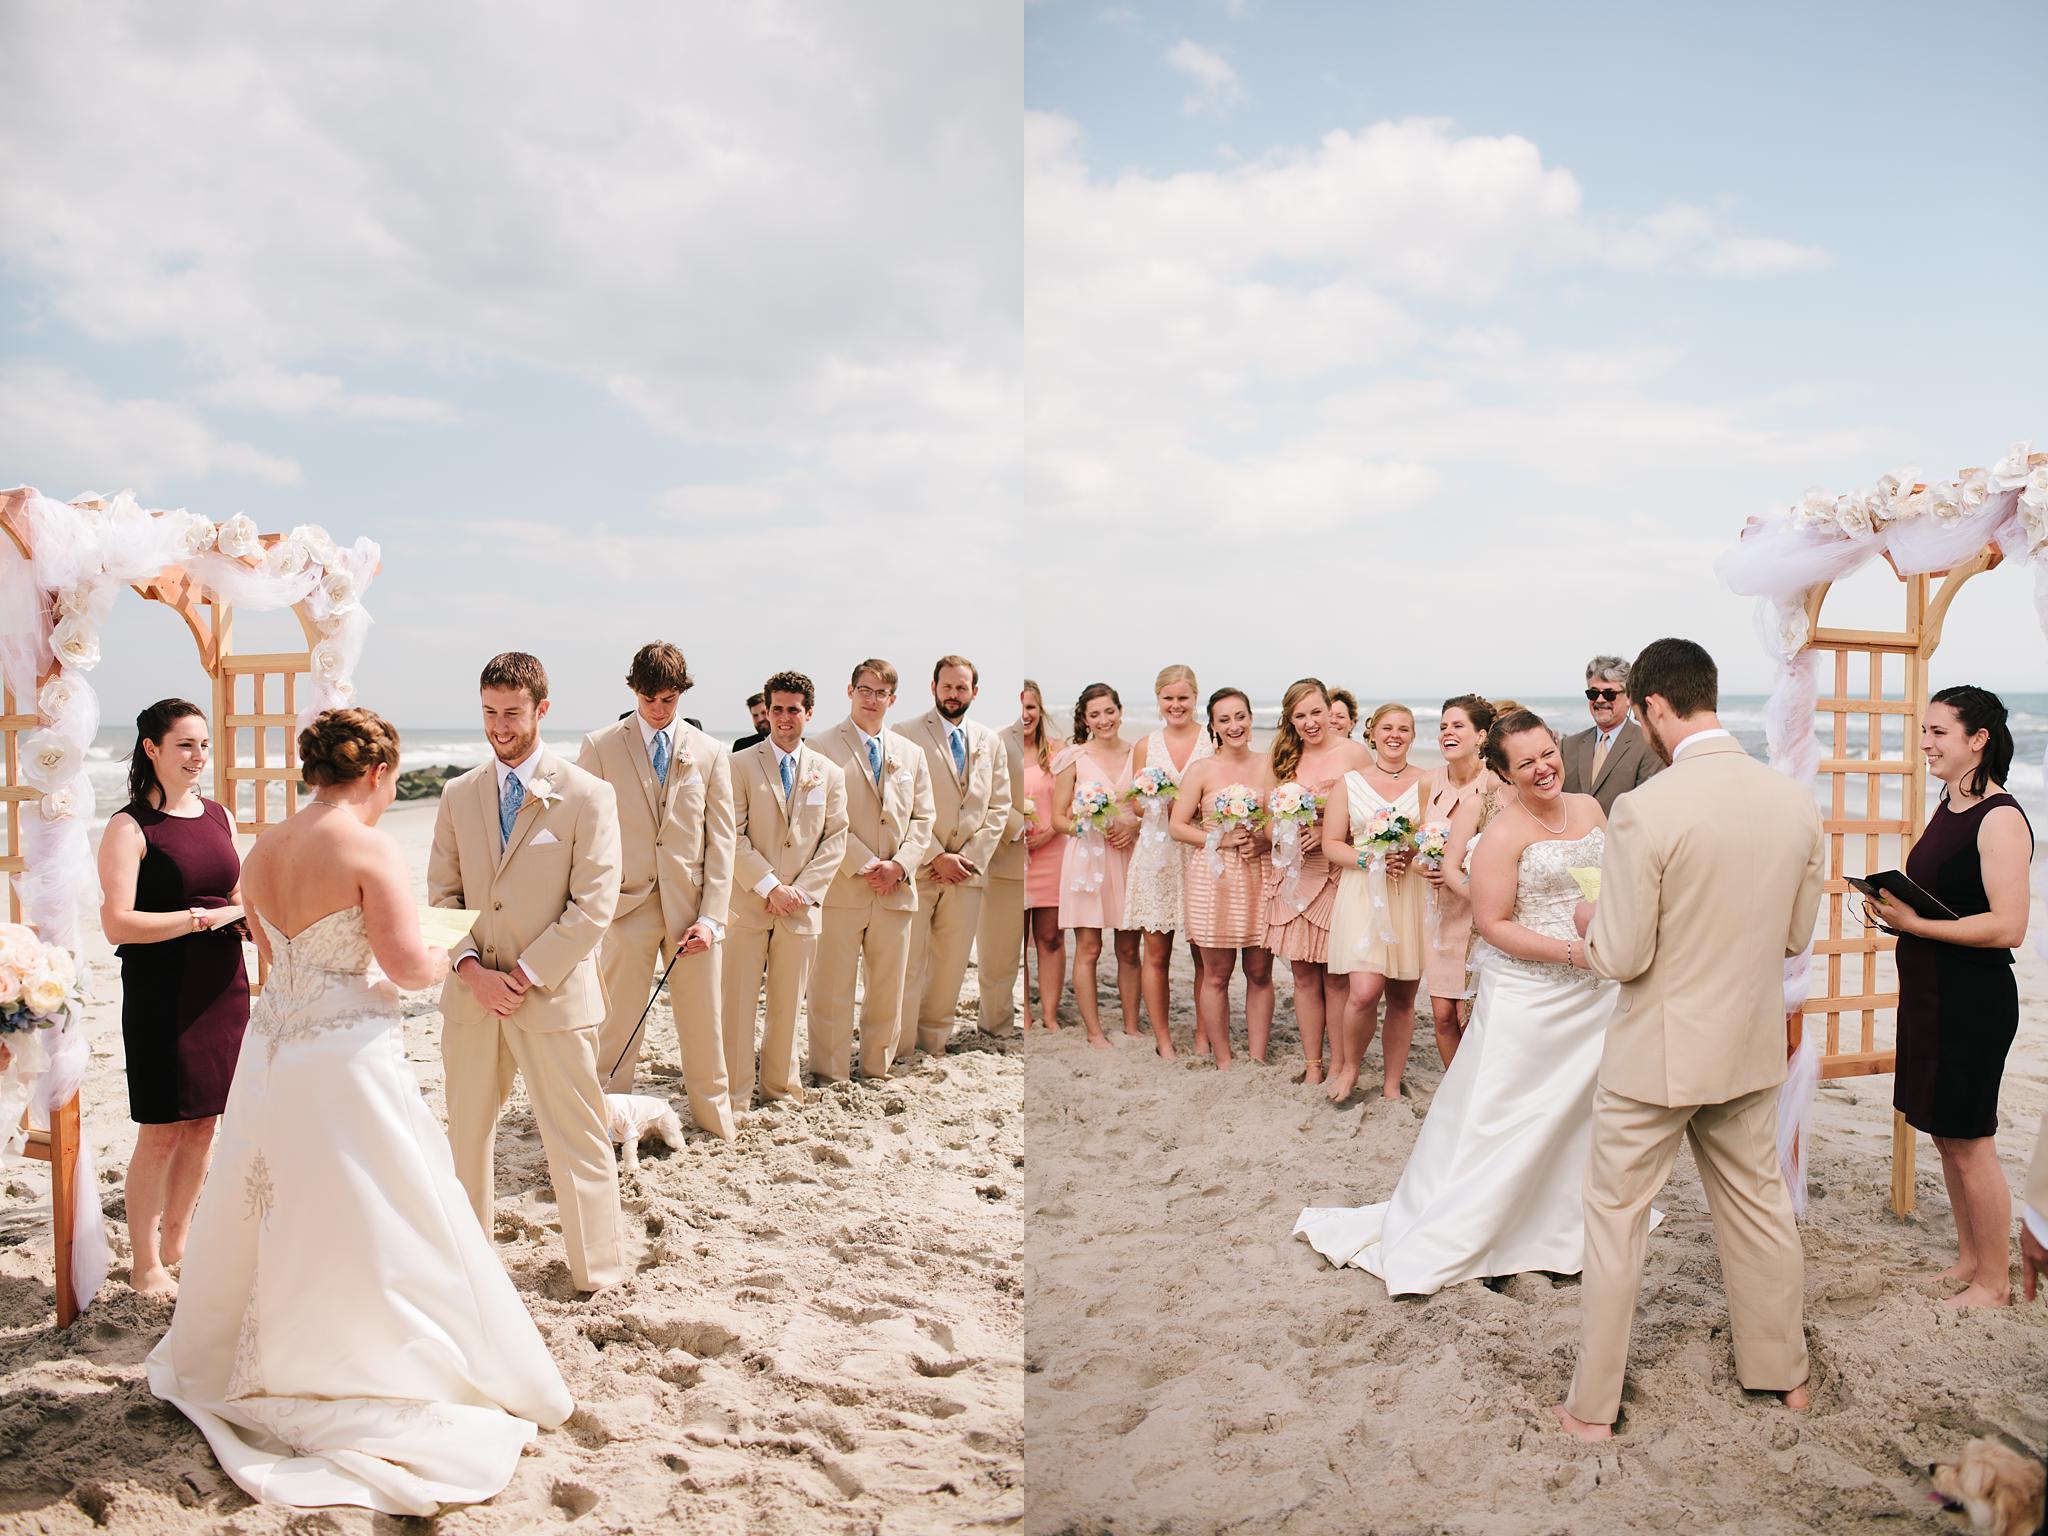 brant_beach_yacht_club_wedding_long_beach_island_nj_wedding_photographer_412.jpg